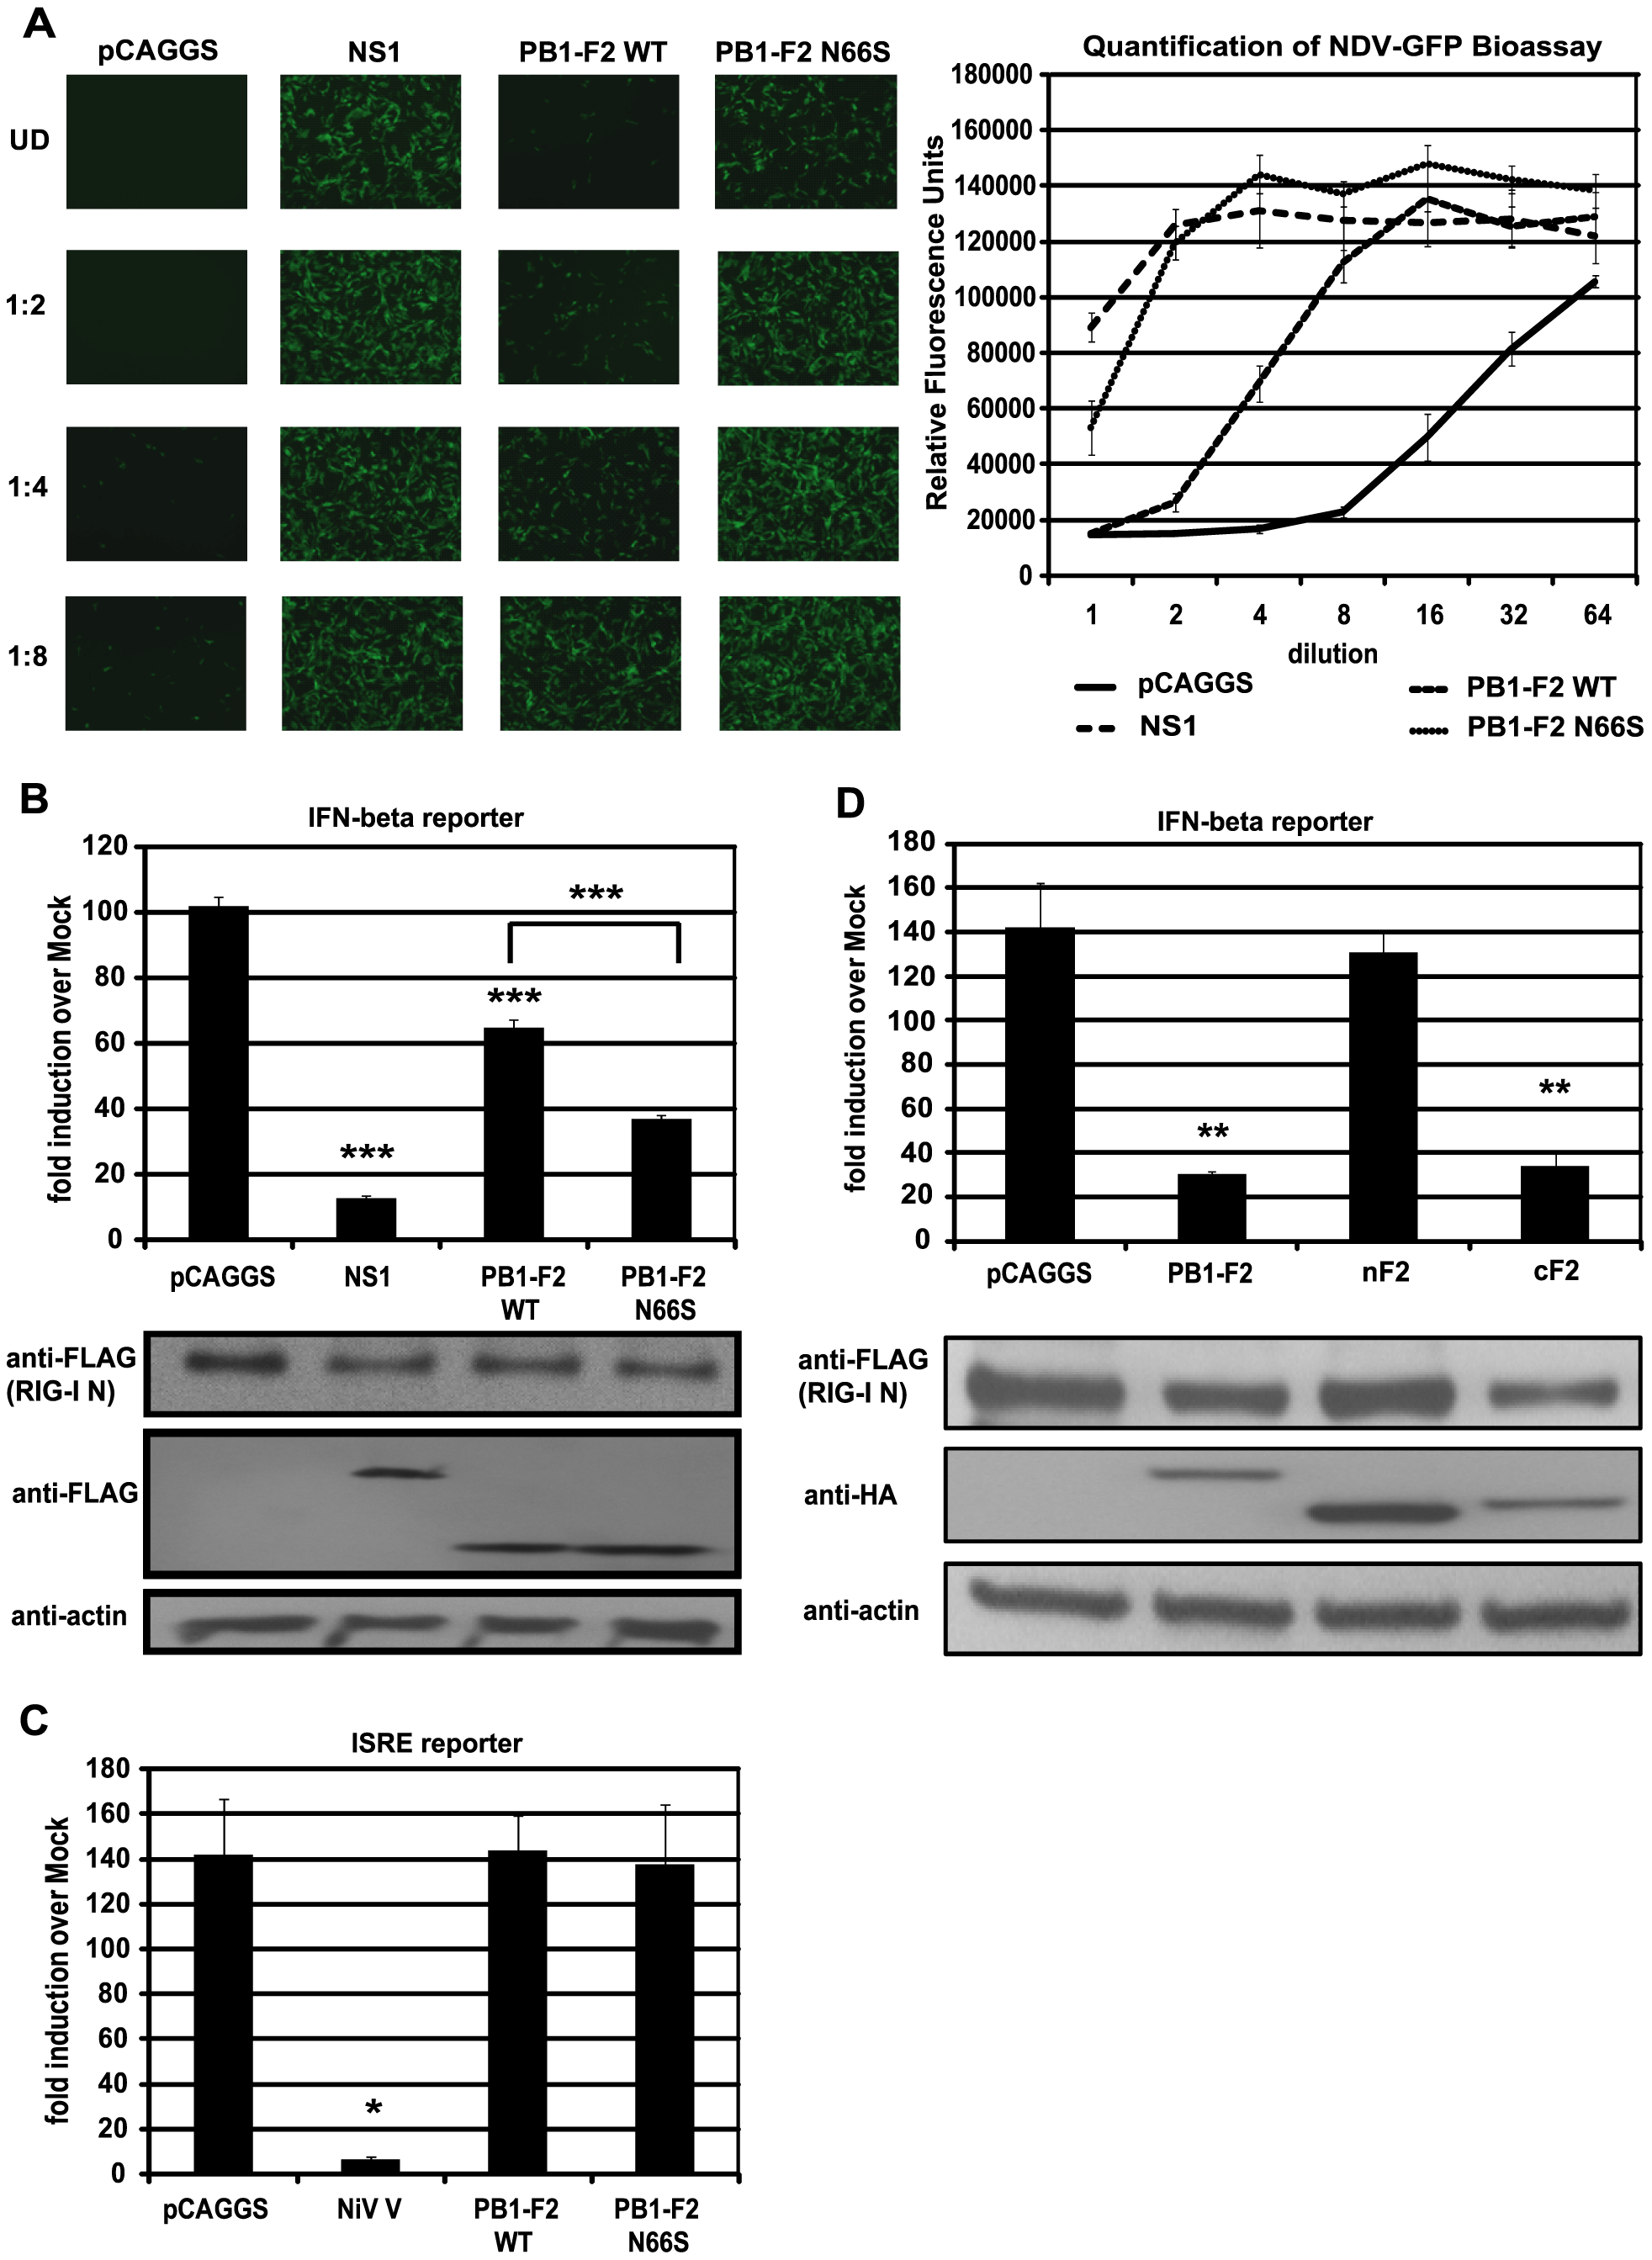 PB1-F2 inhibits RIG-I N induced IFN via its C-terminal domain.